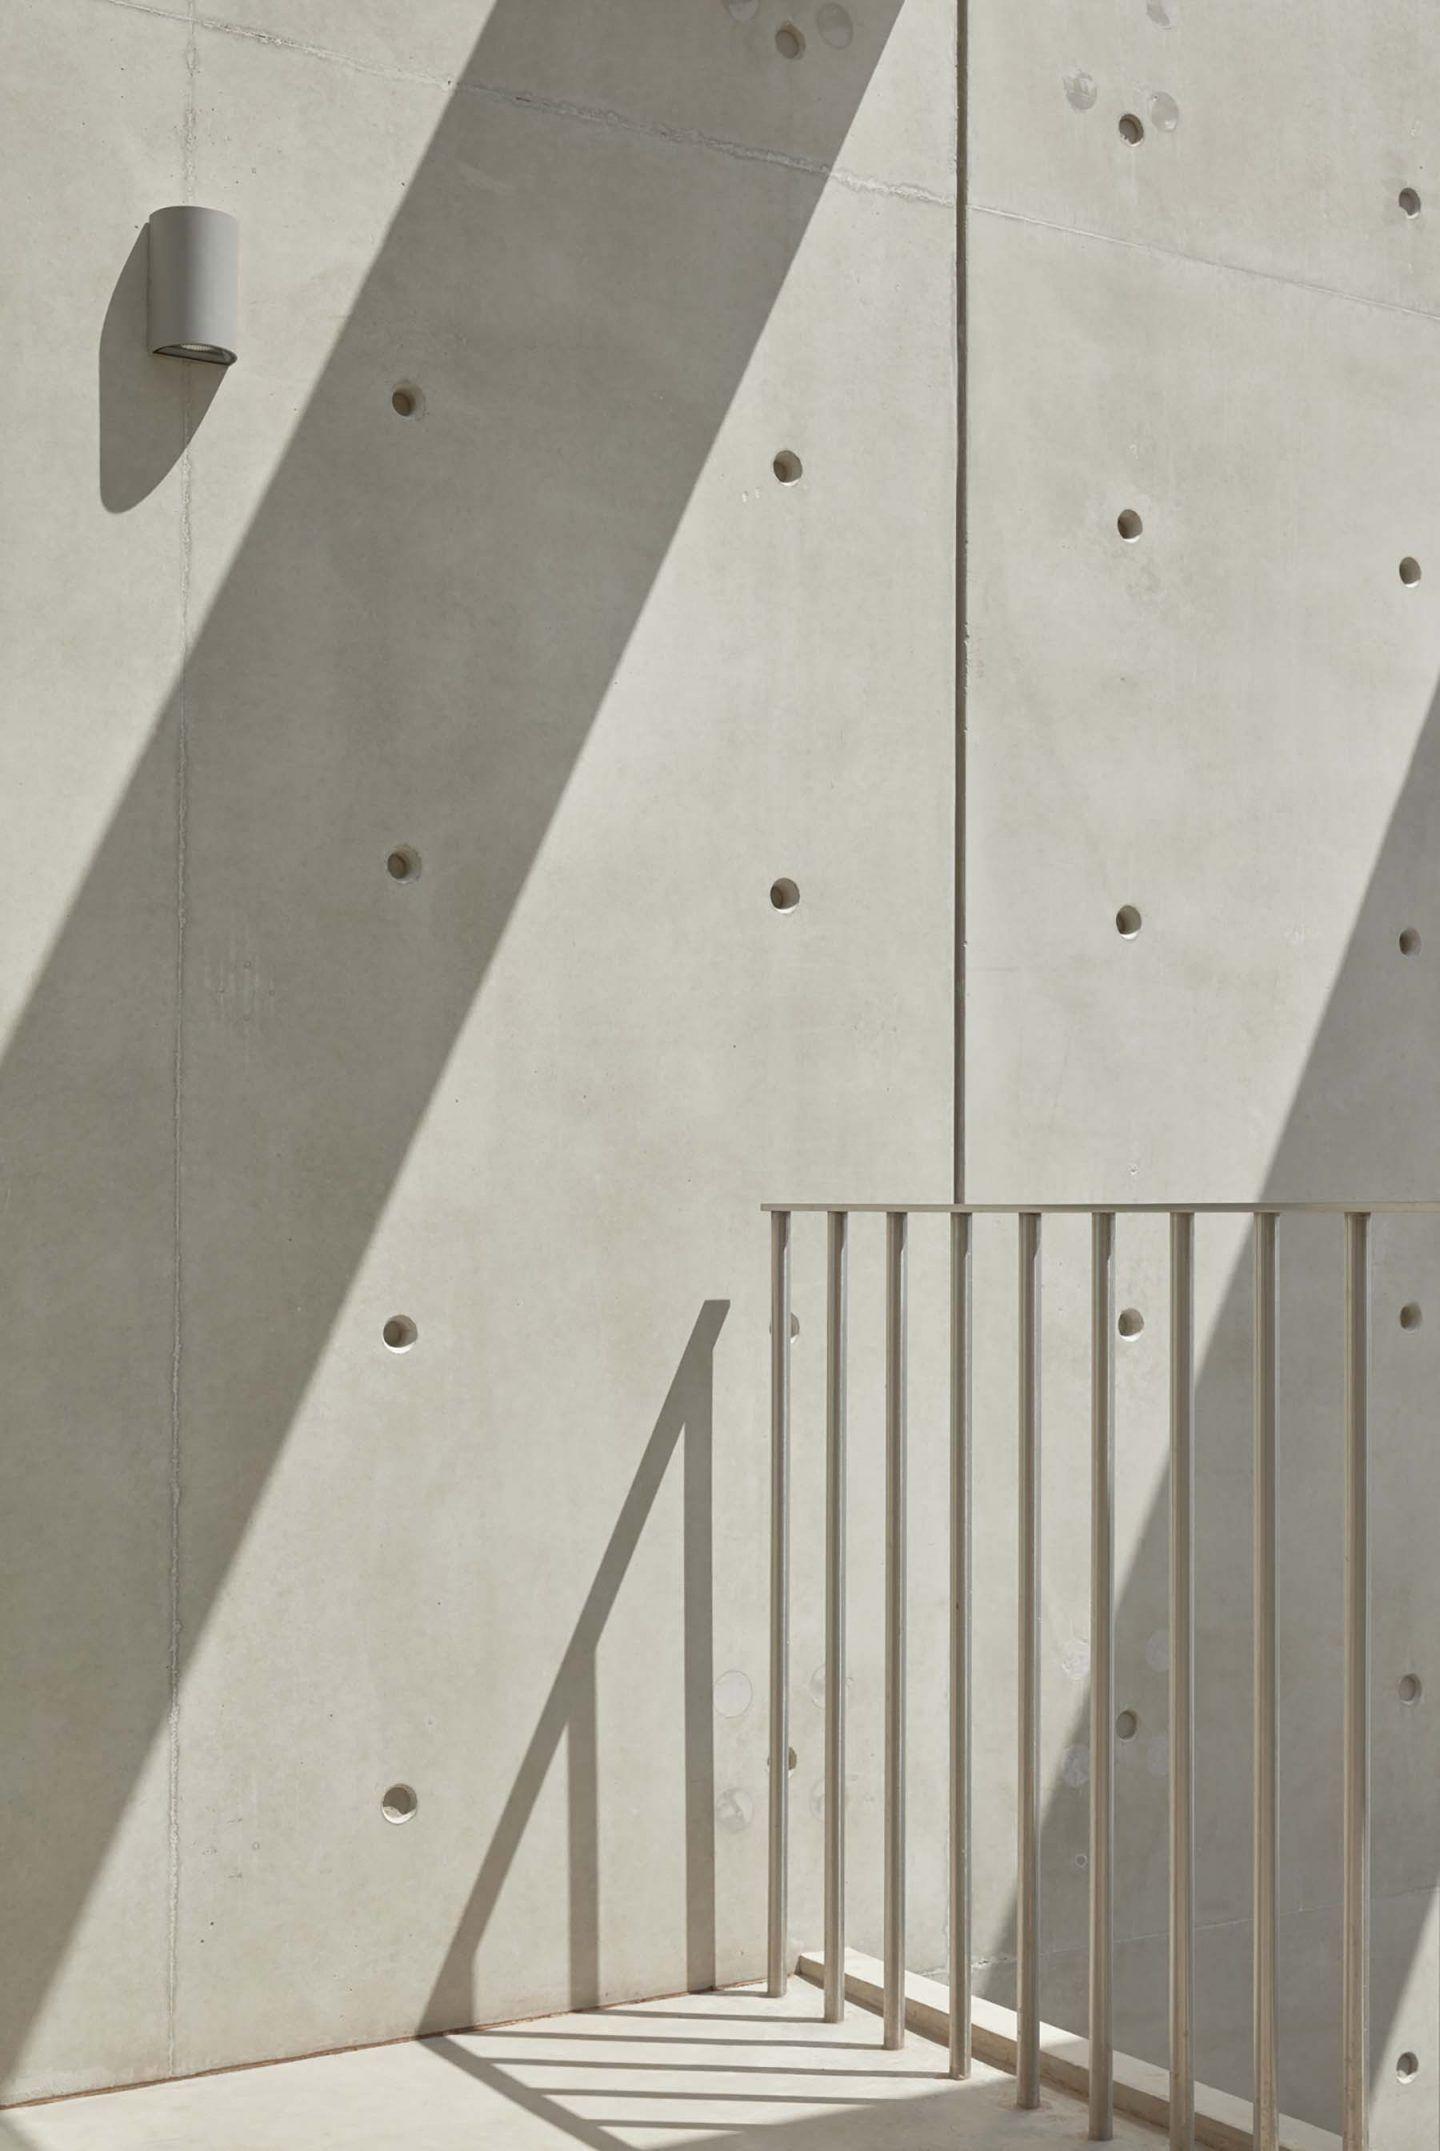 IGNANT-Architecture-Oliver-du-Puy-Architects-Skinny-House-5